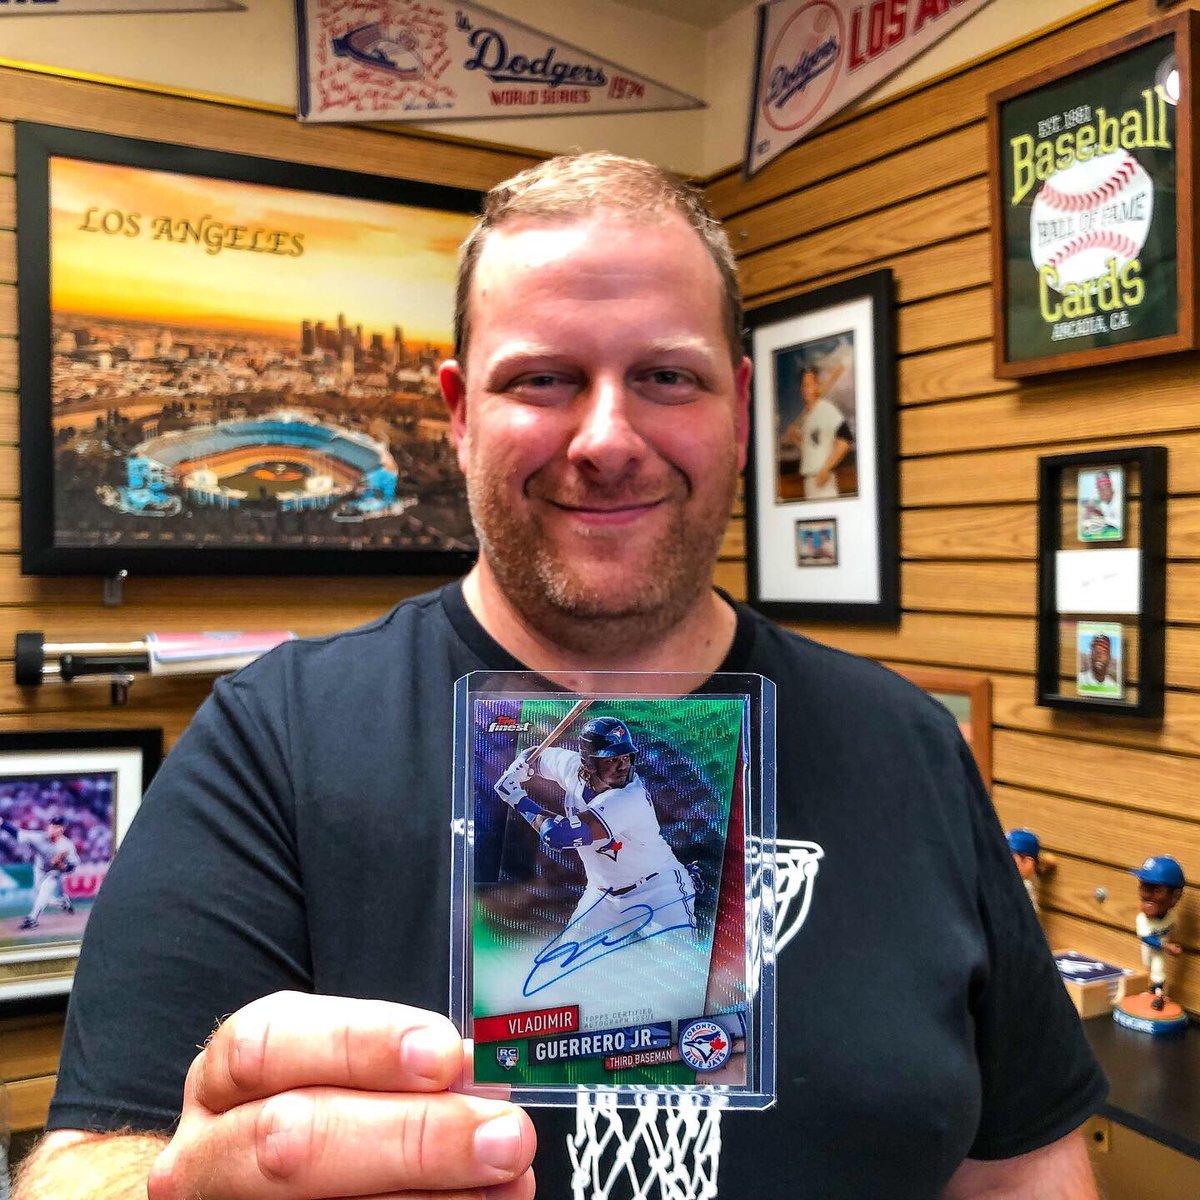 Hofbaseballcard Hall Of Fame Baseball Cards Twitter Profile Twitock